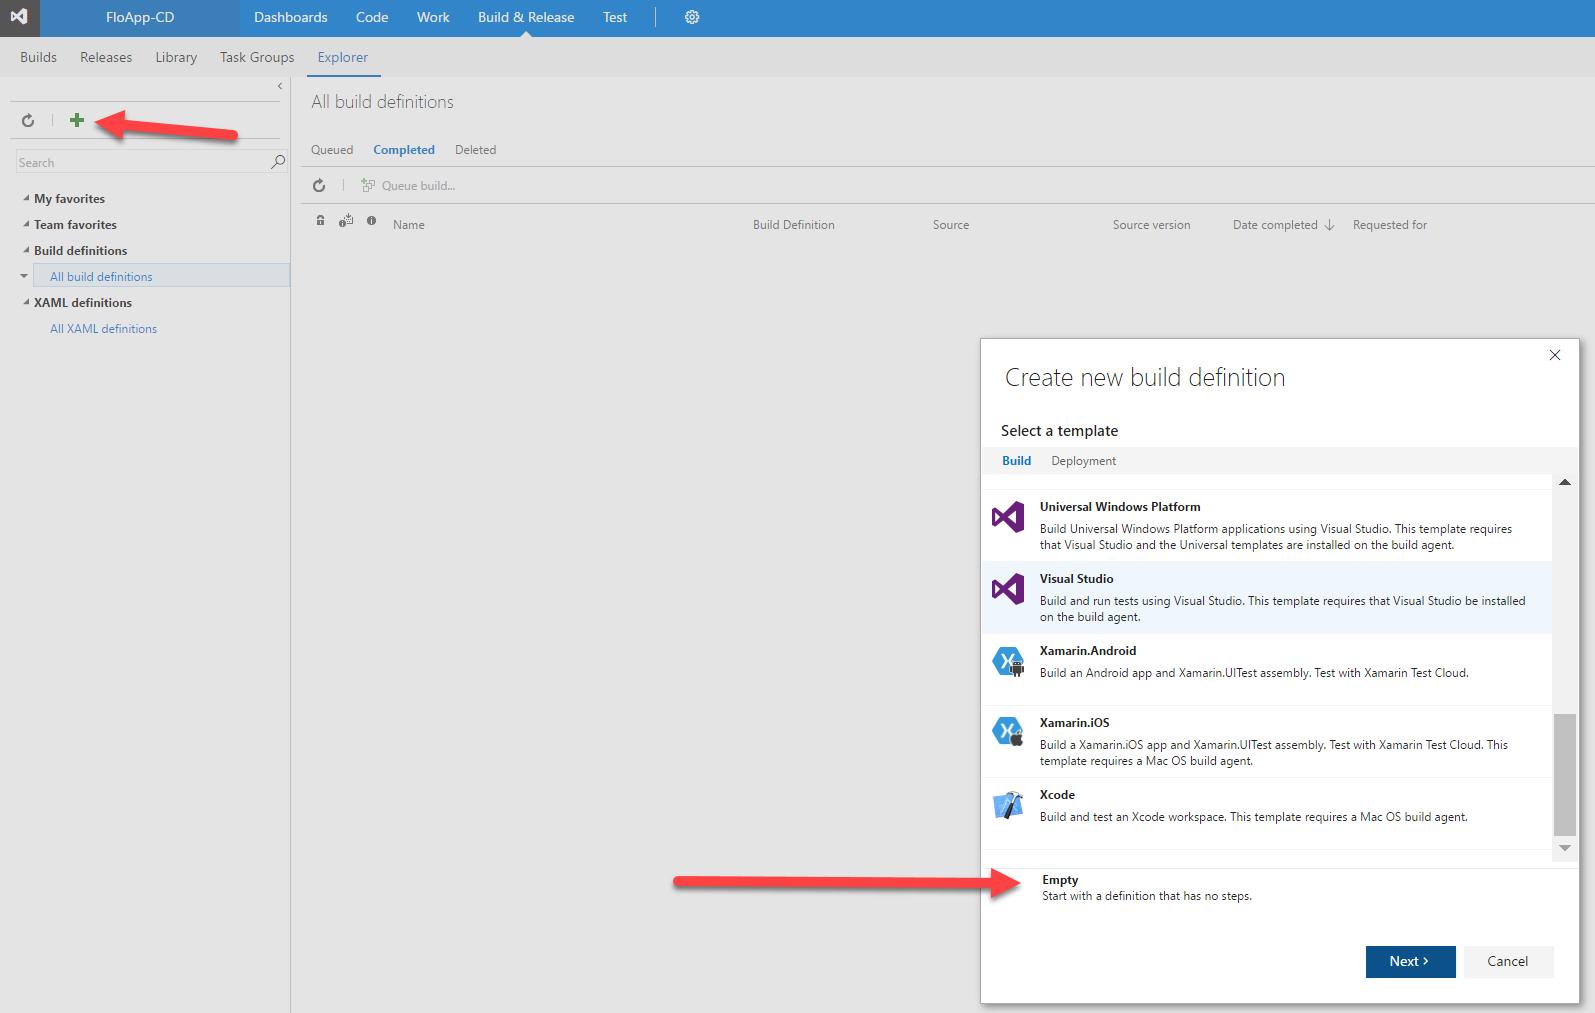 Azure] Continuous Integration / Continuous Deployment with Docker